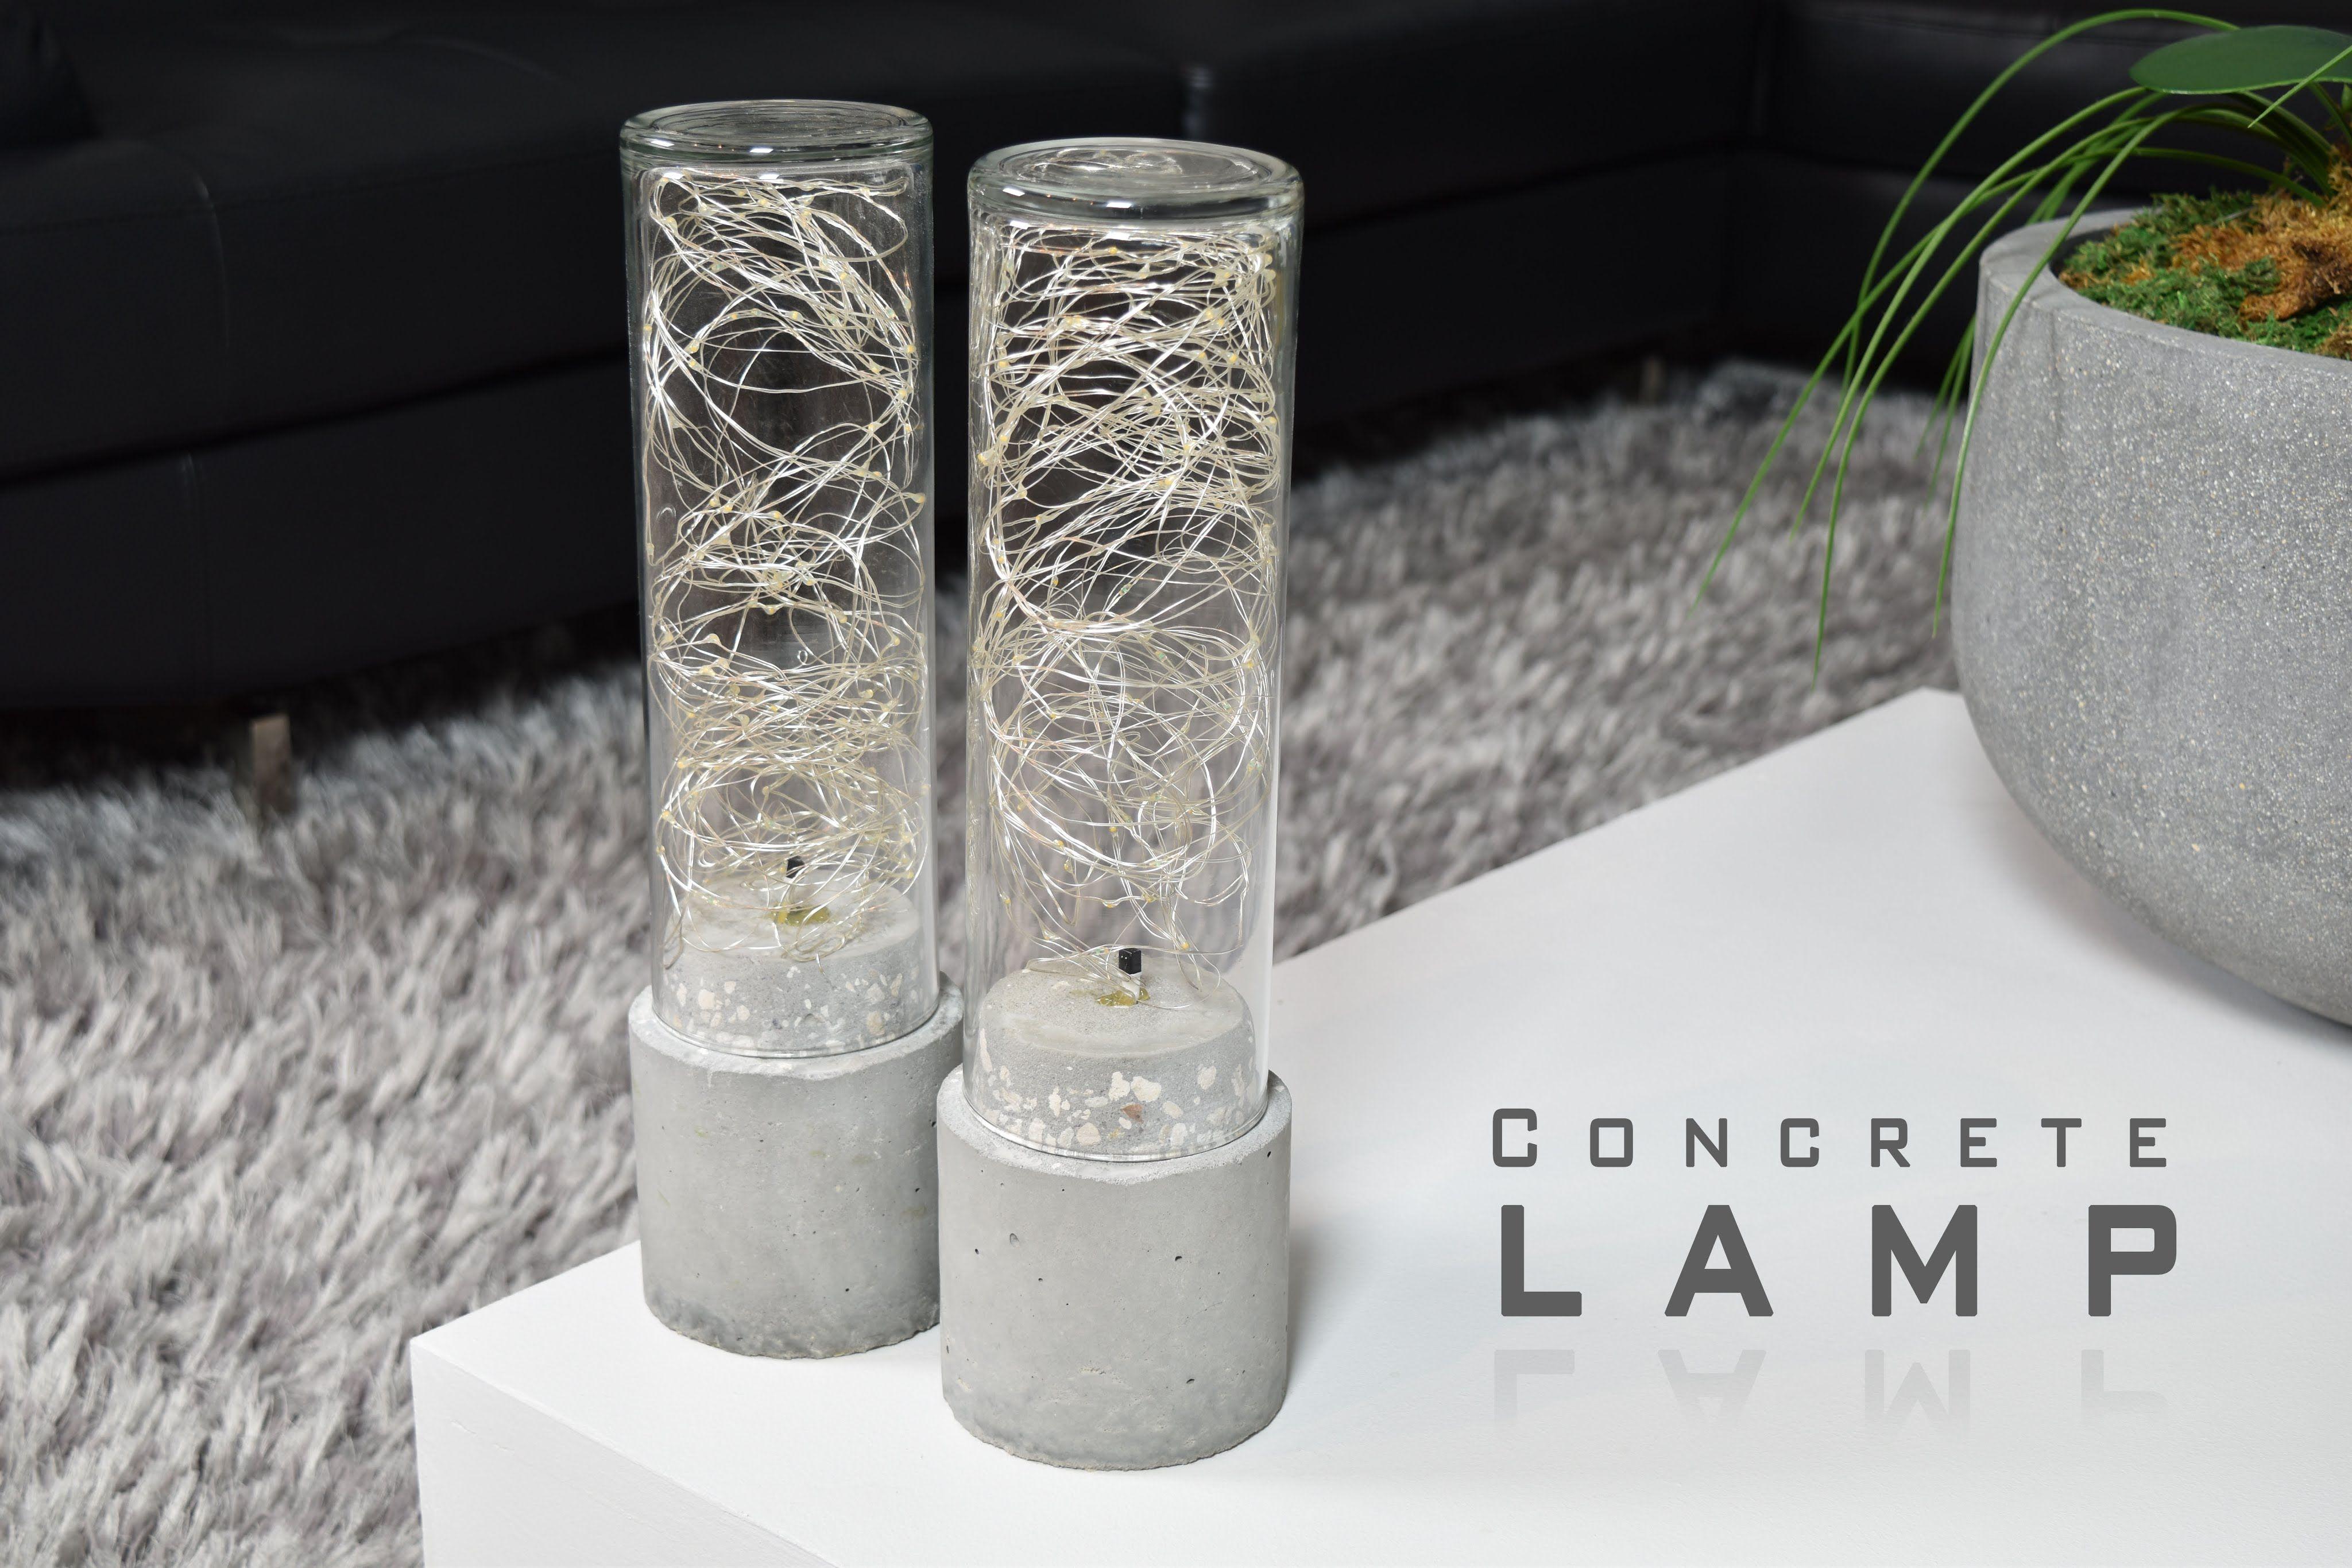 Make A Lamp Using Concrete And Led String Lights. Litom Led String Lights  Http: